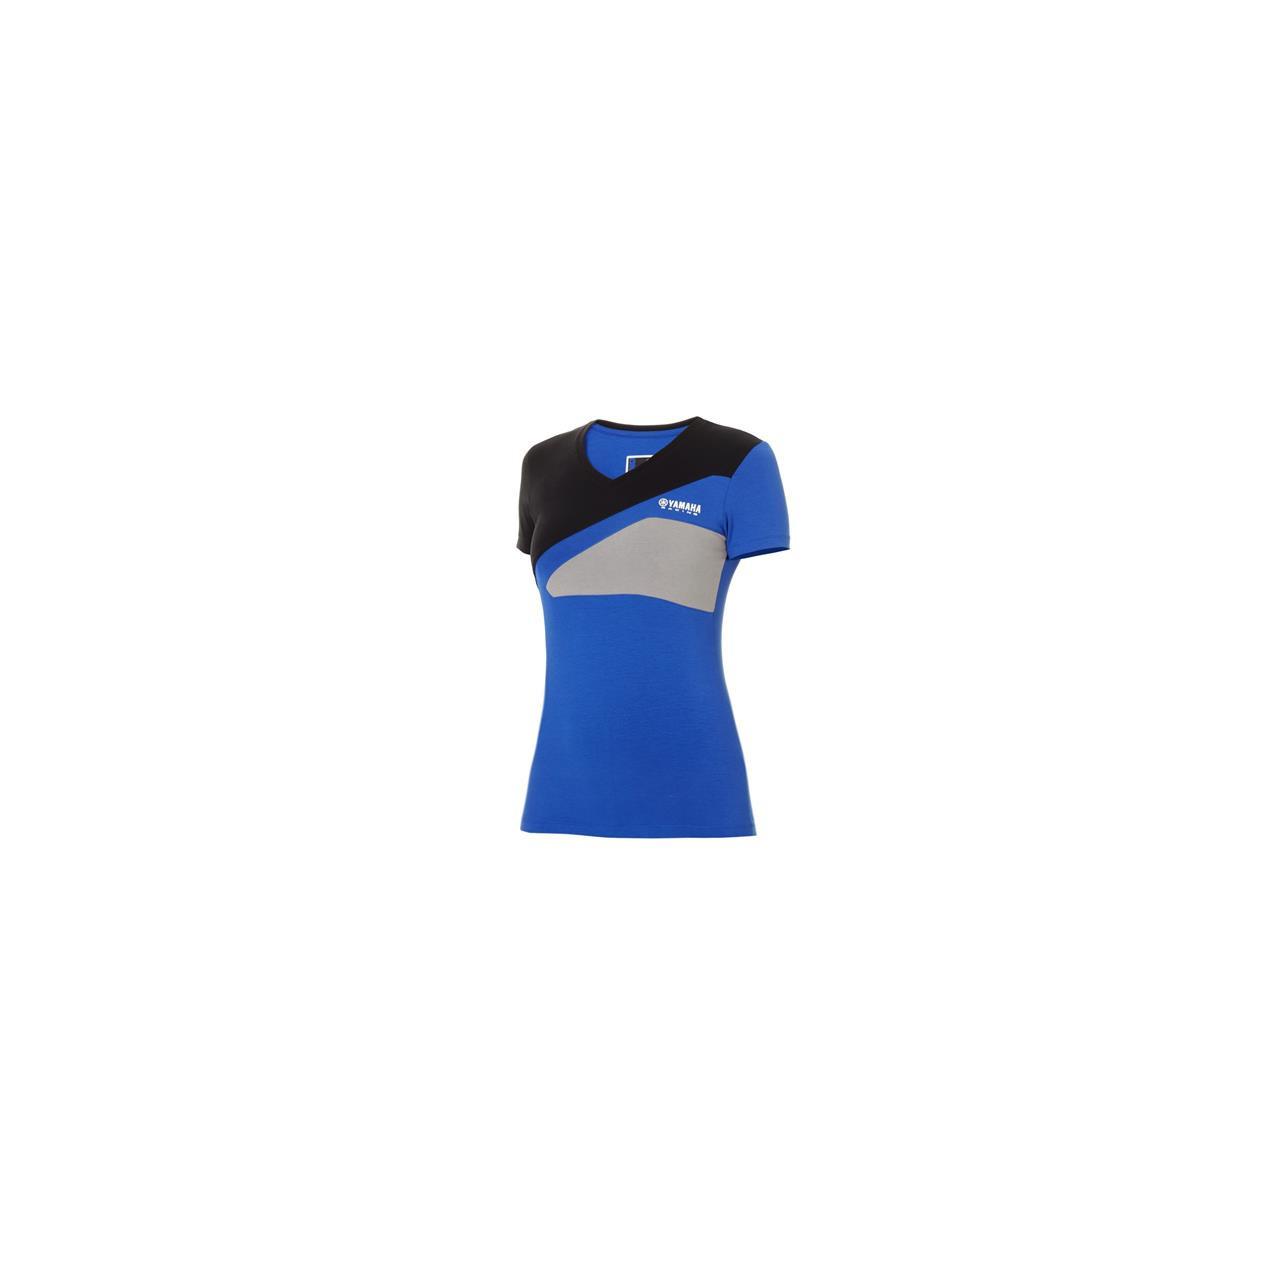 YAMAHA T-shirt Paddock Bleu femme 2018